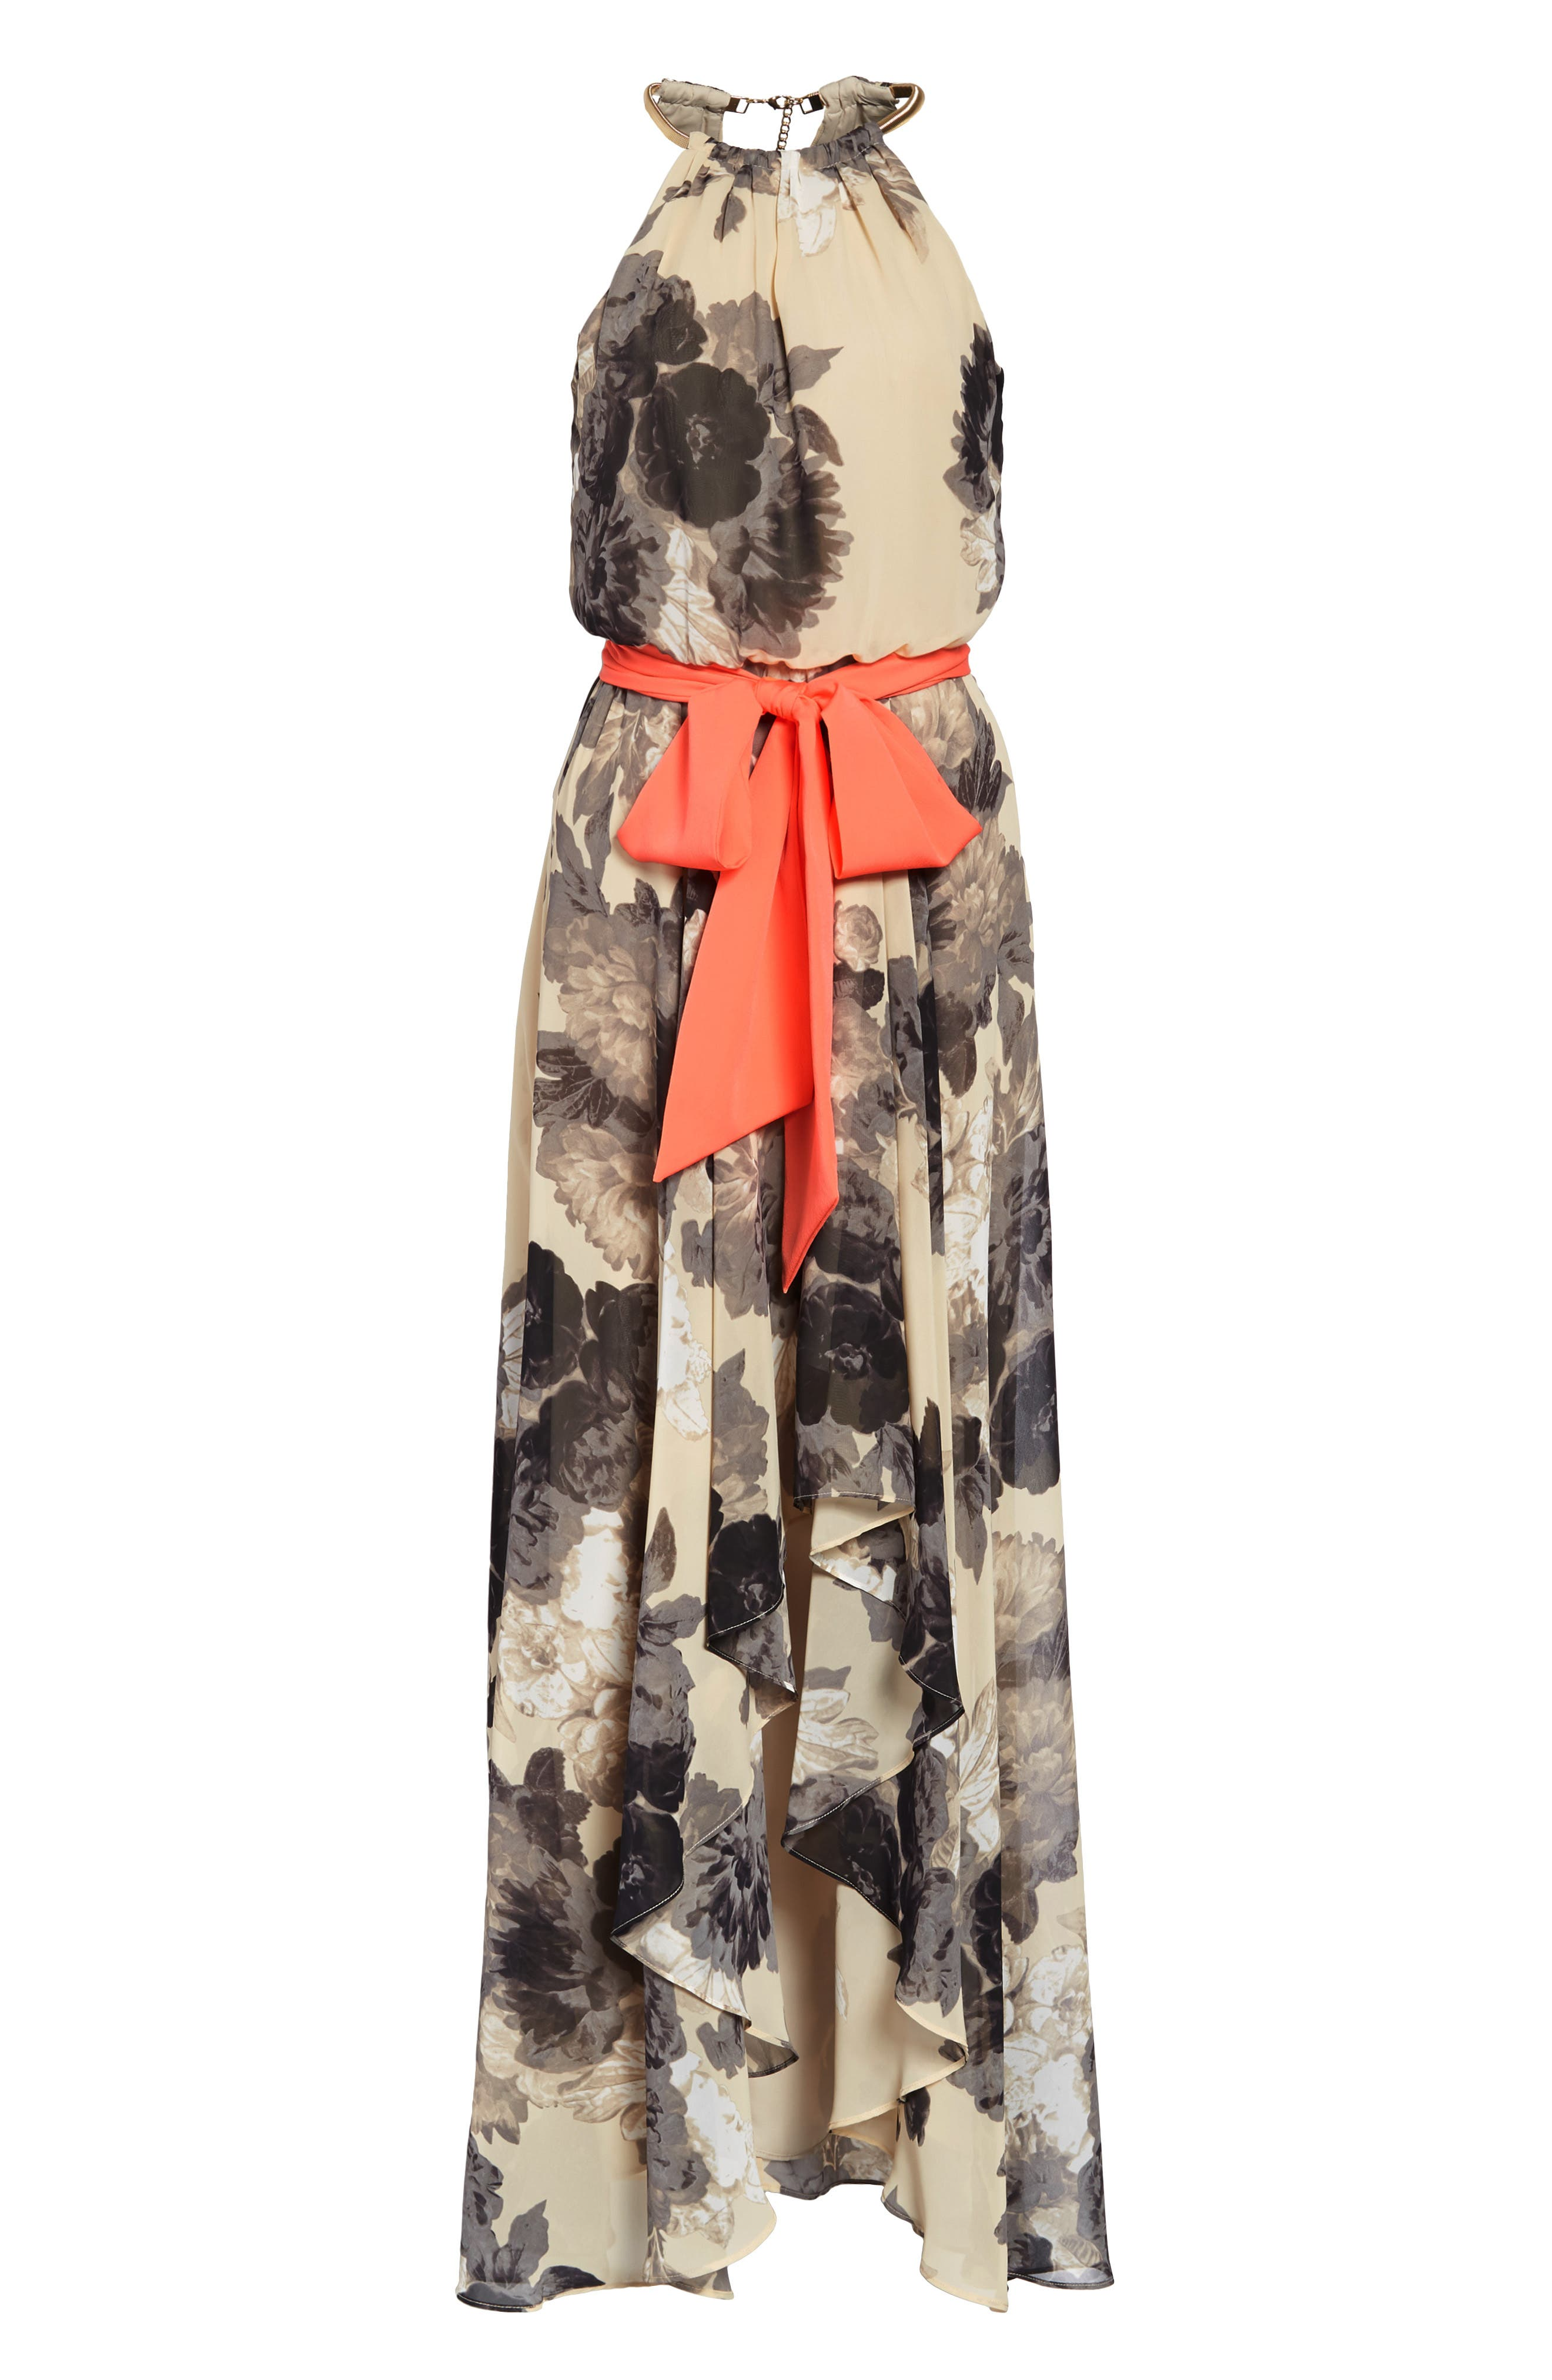 Floral Print Chiffon Maxi Dress,                             Alternate thumbnail 9, color,                             TAUPE/ BLACK